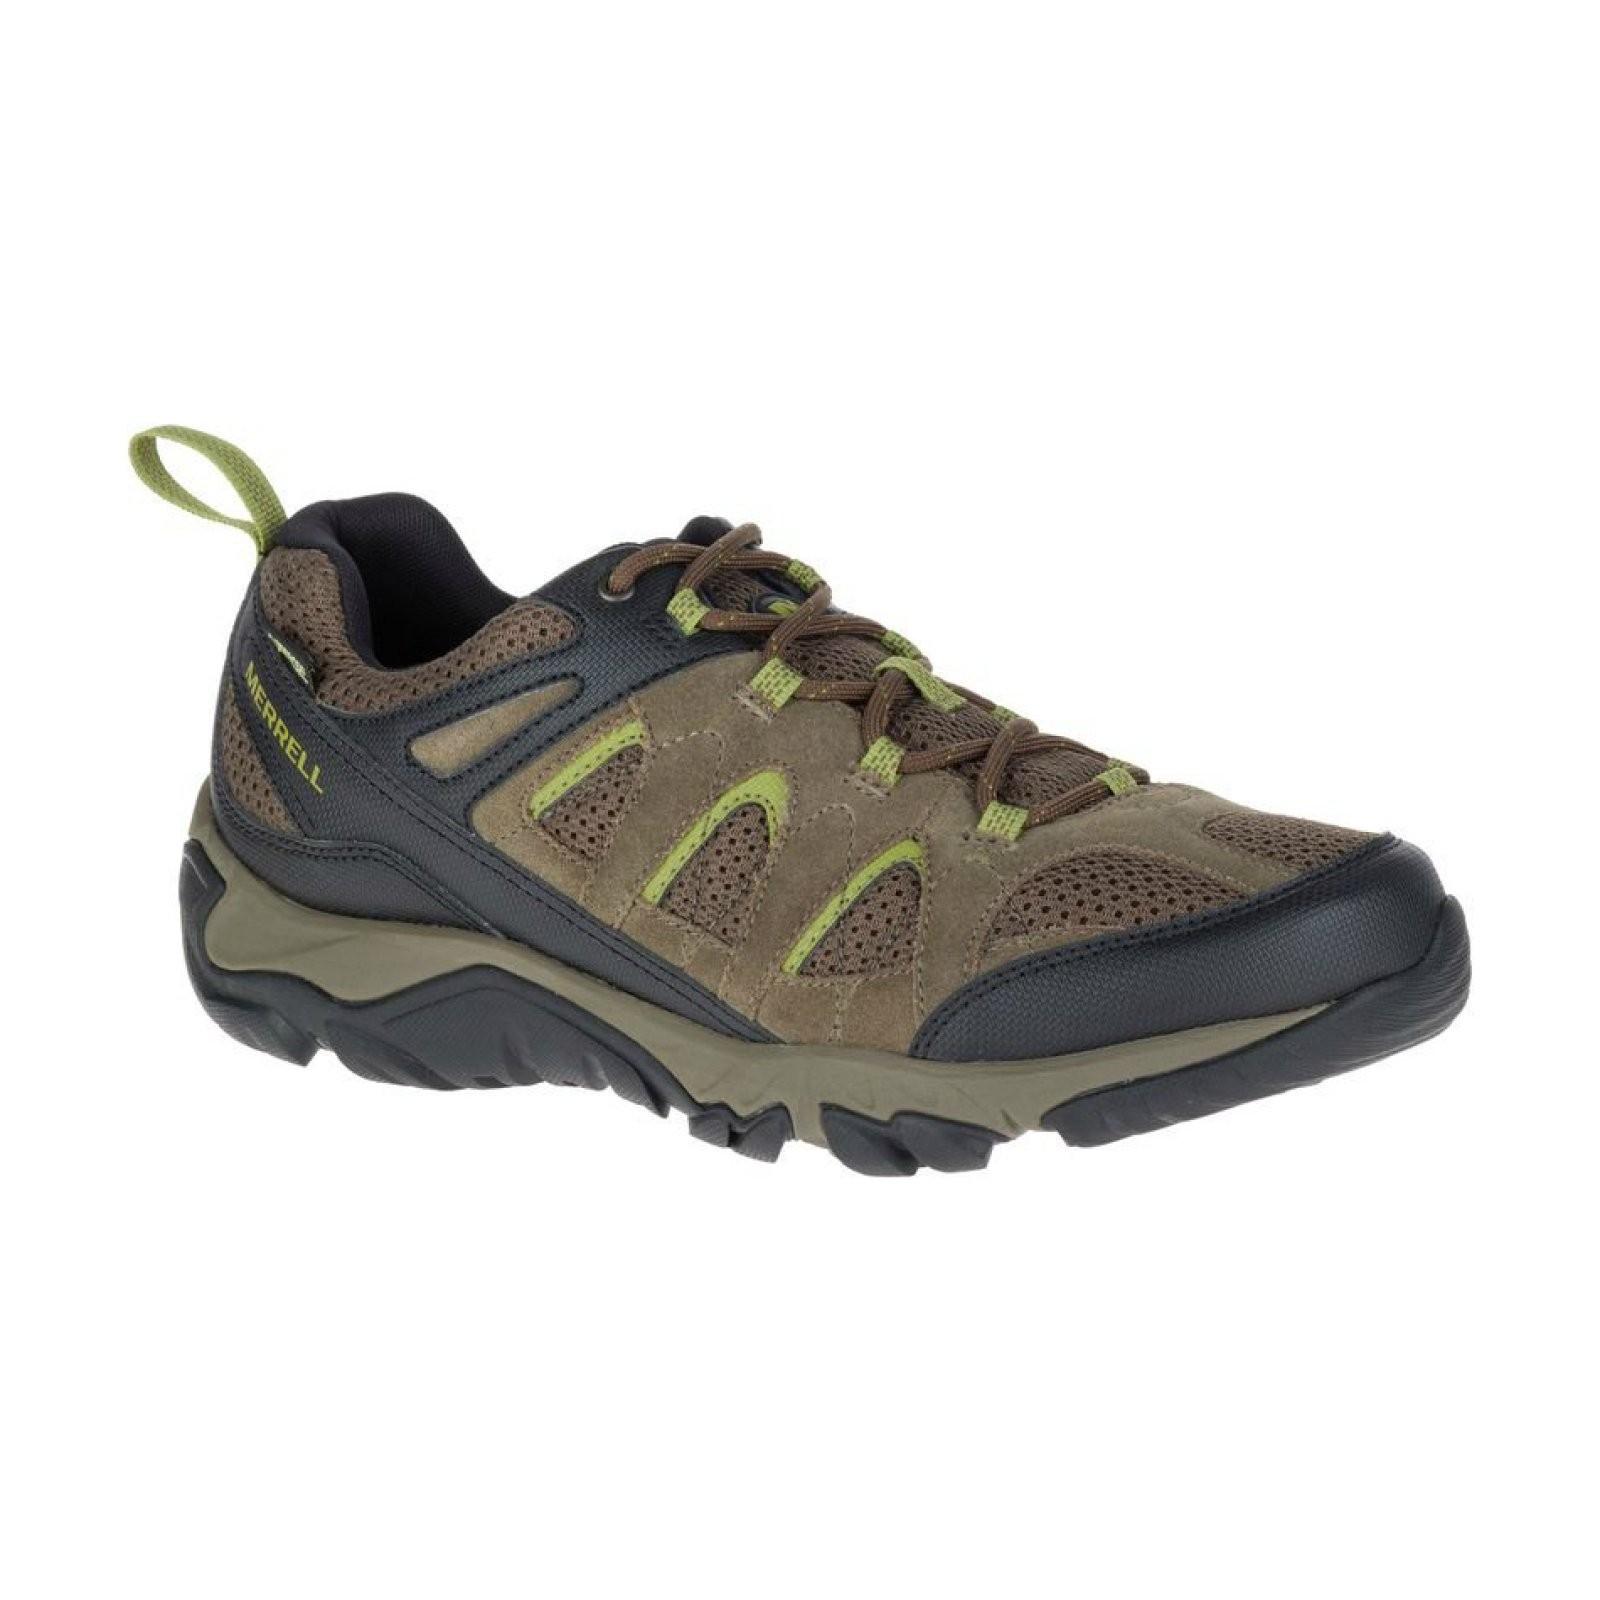 a4903137128 Pánské Treková obuv Boty Merrell OUTMOST VENT GTX